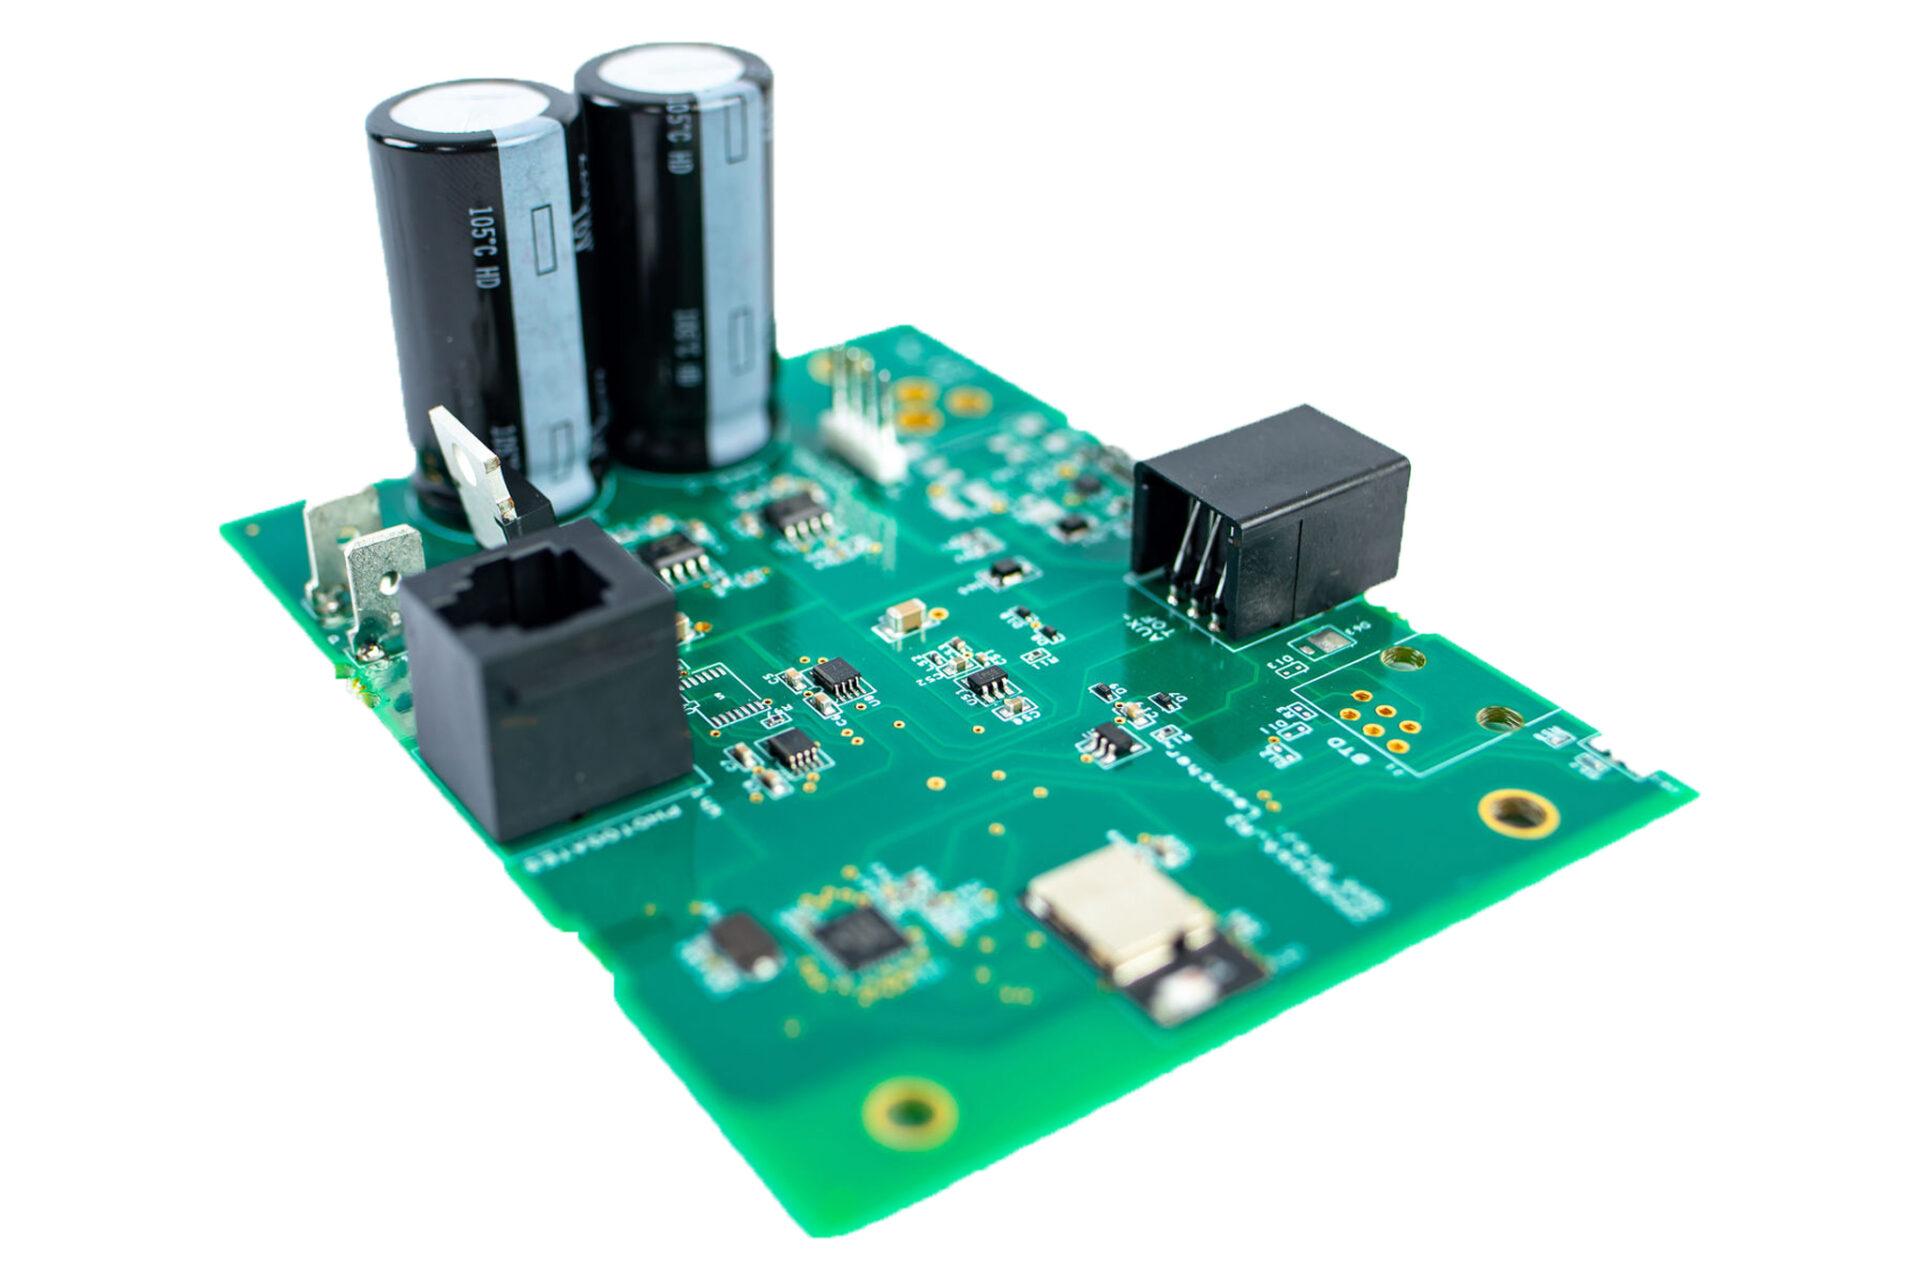 close up of PCB board